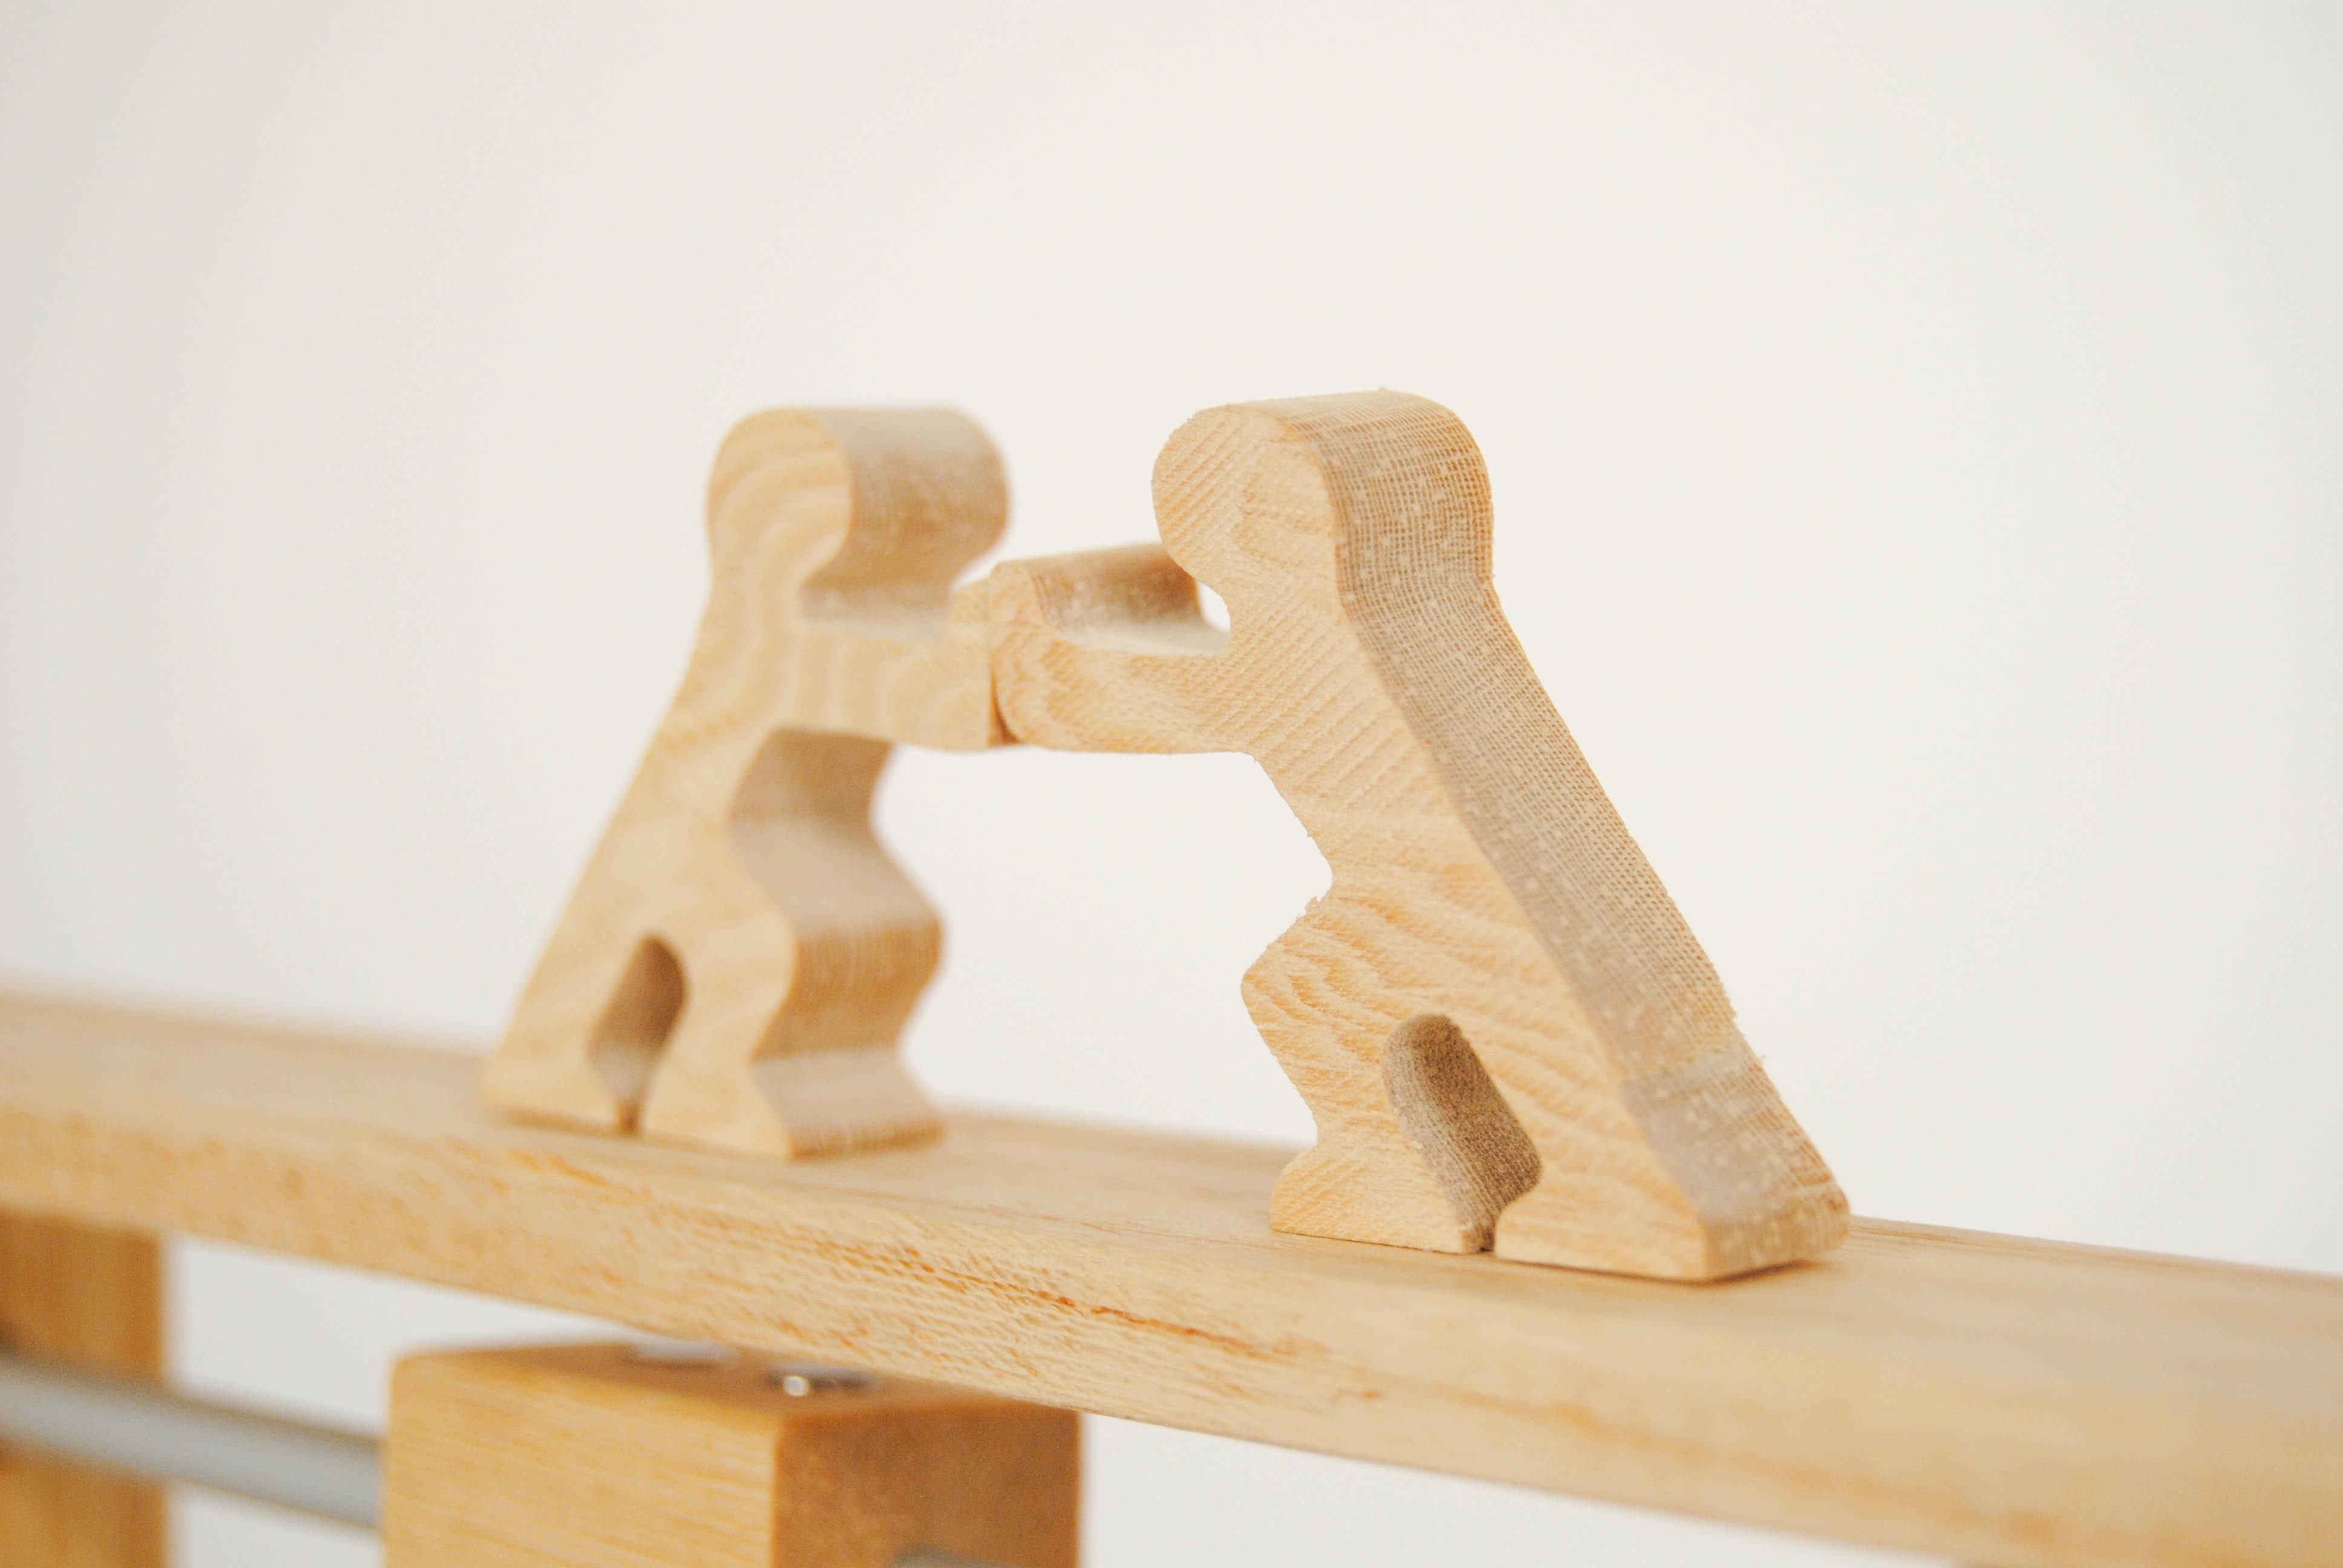 leonardo da vinci magnetic wooden toy with kids shove